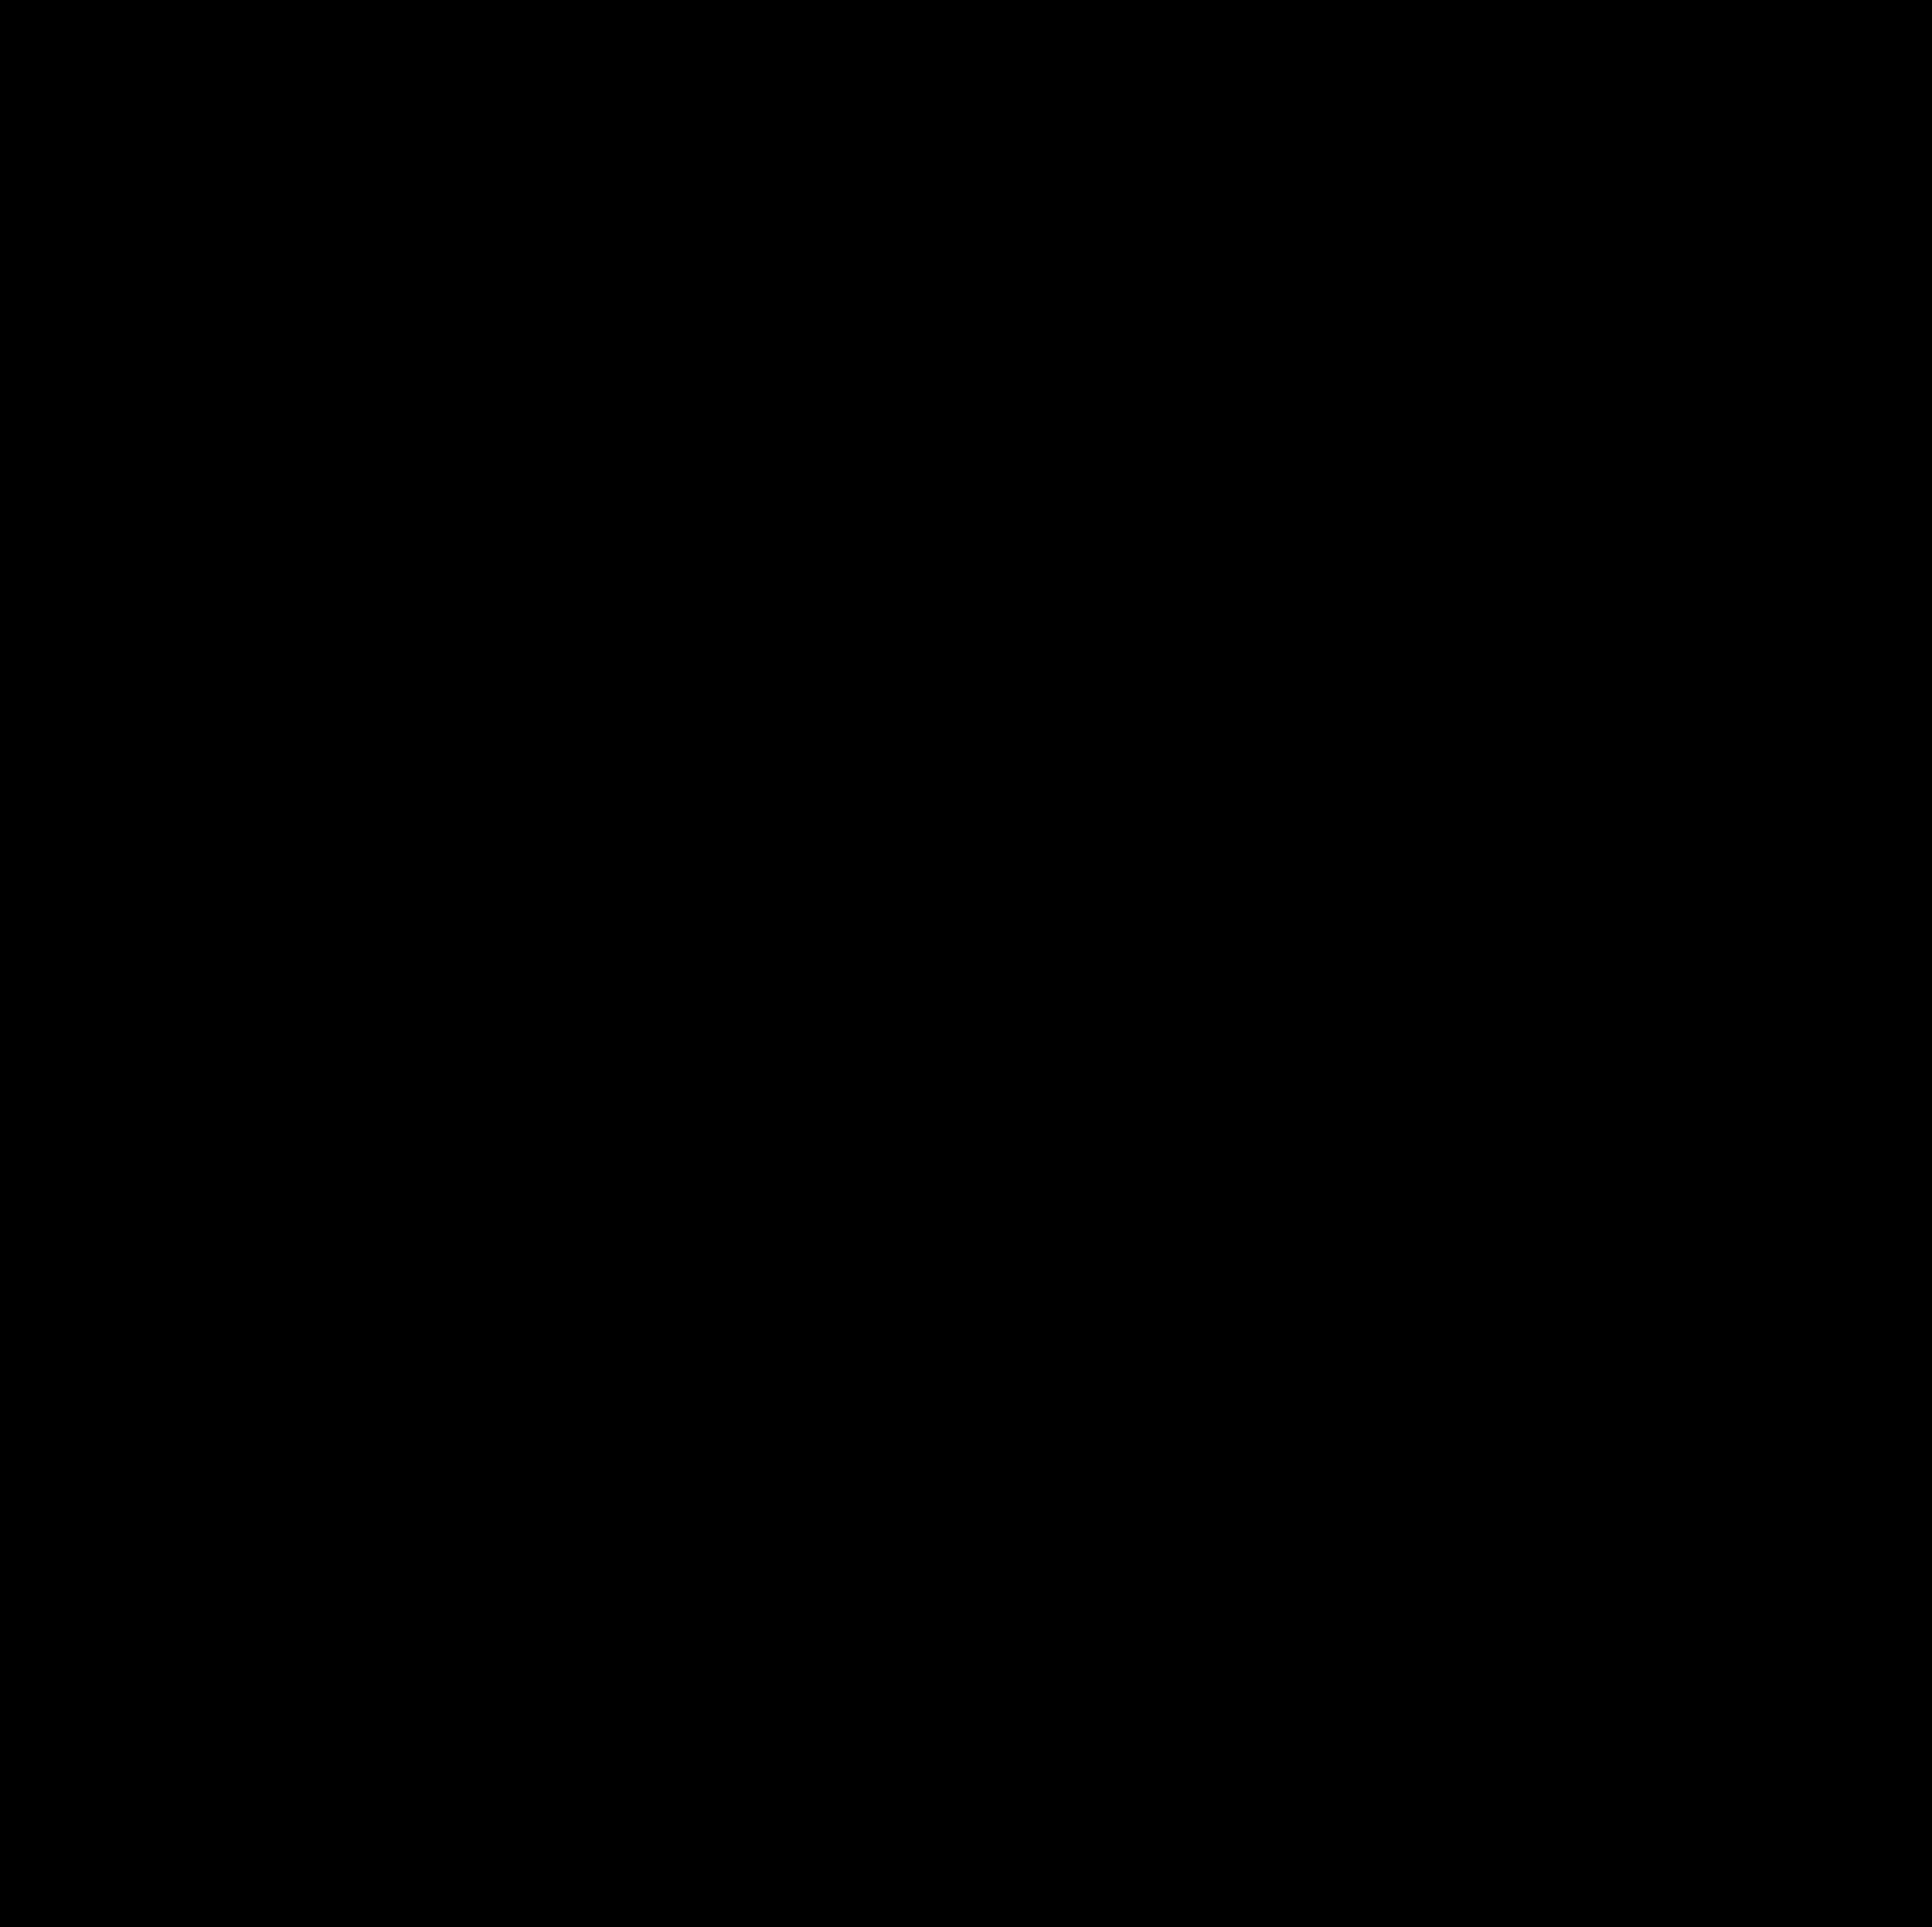 Space4Good_logo_transparent copy.png